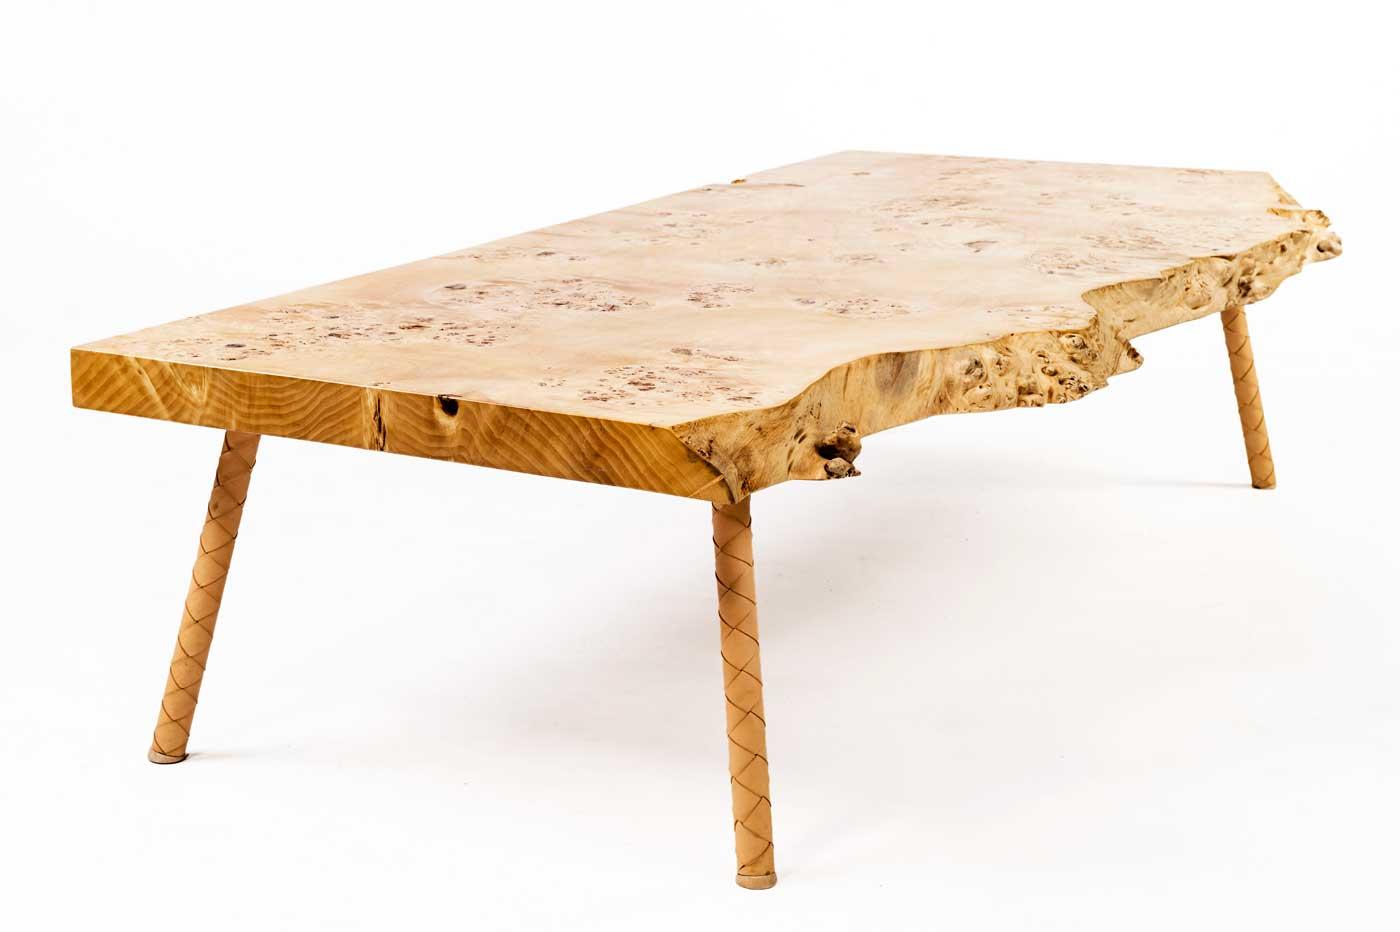 is poplar good for furniture. Is Poplar Good For Furniture